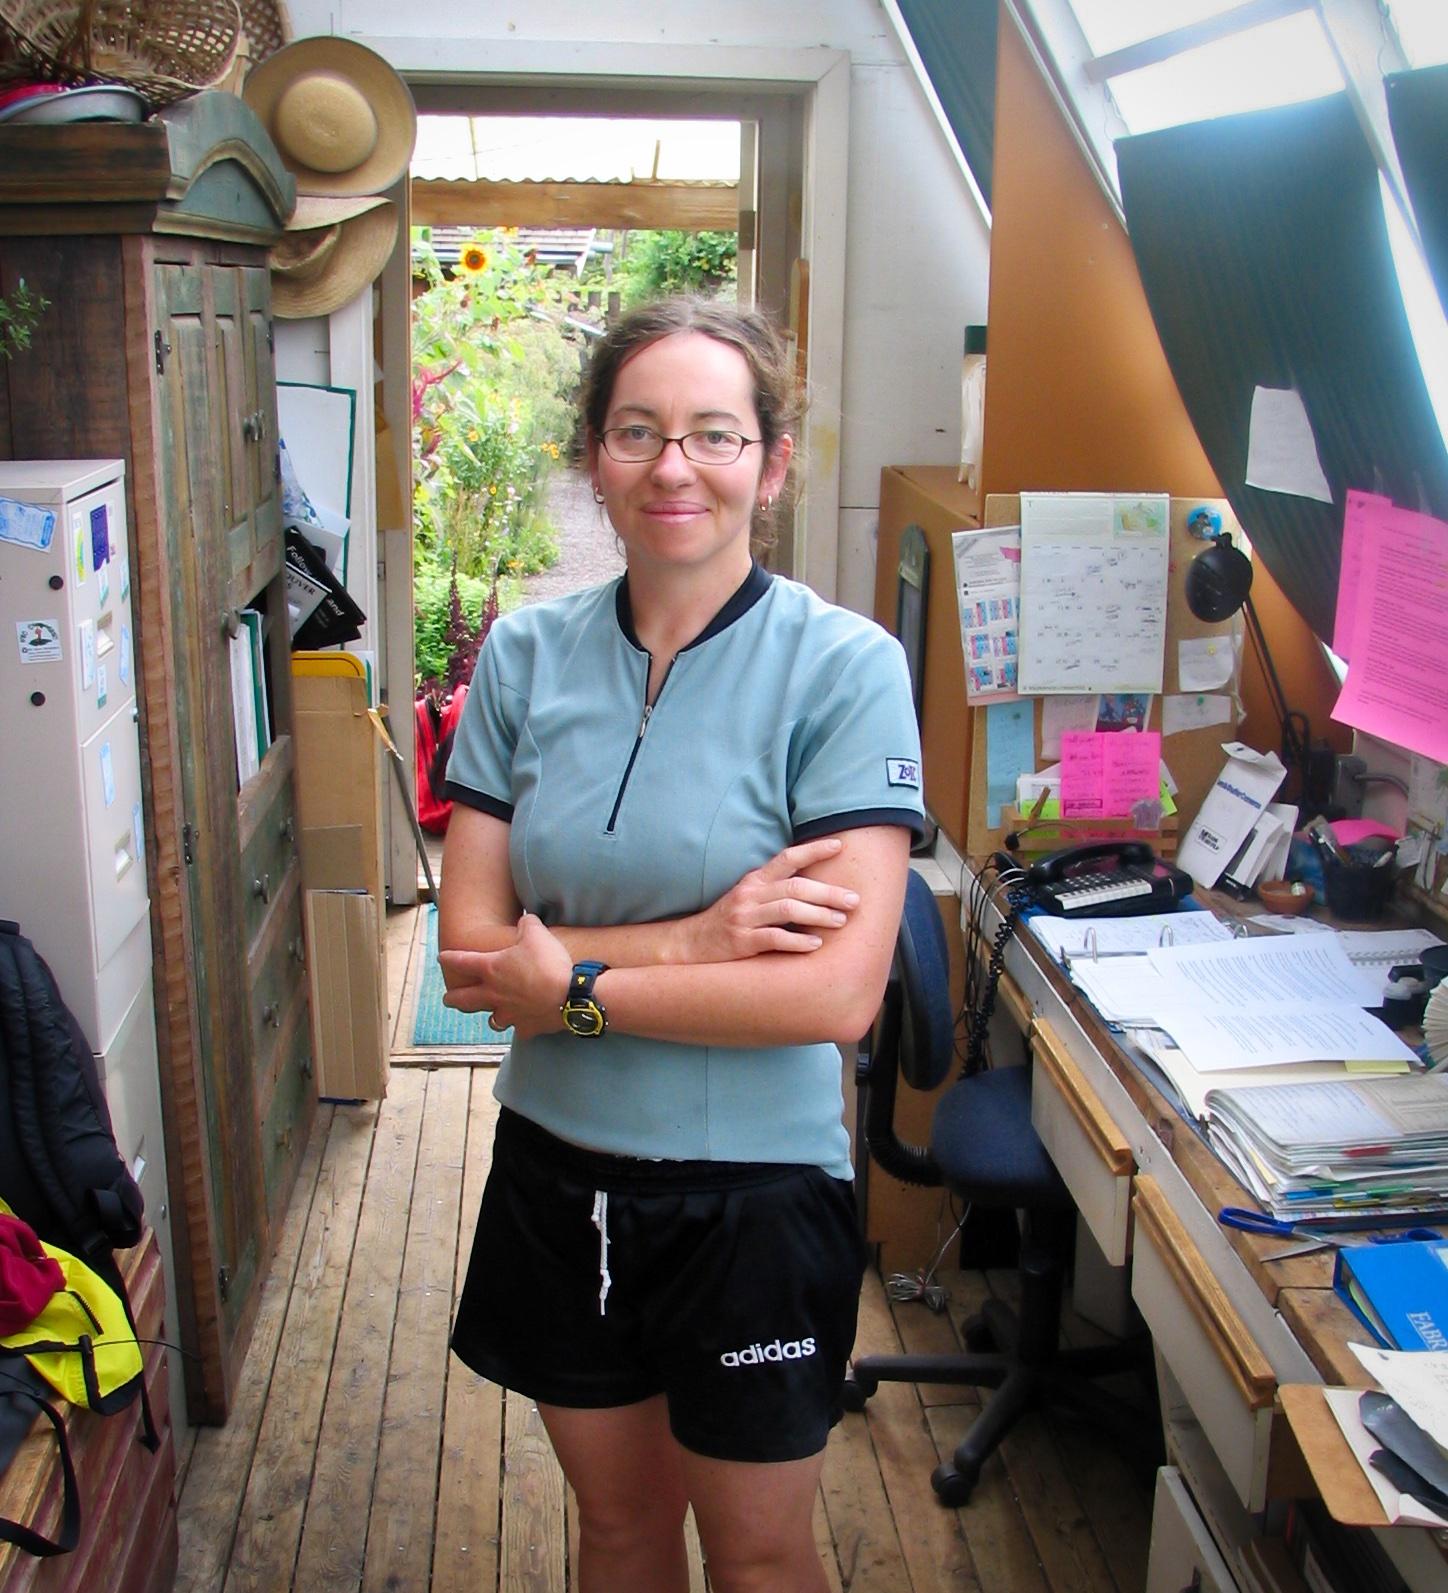 Judith Cowan, Landscape Architect